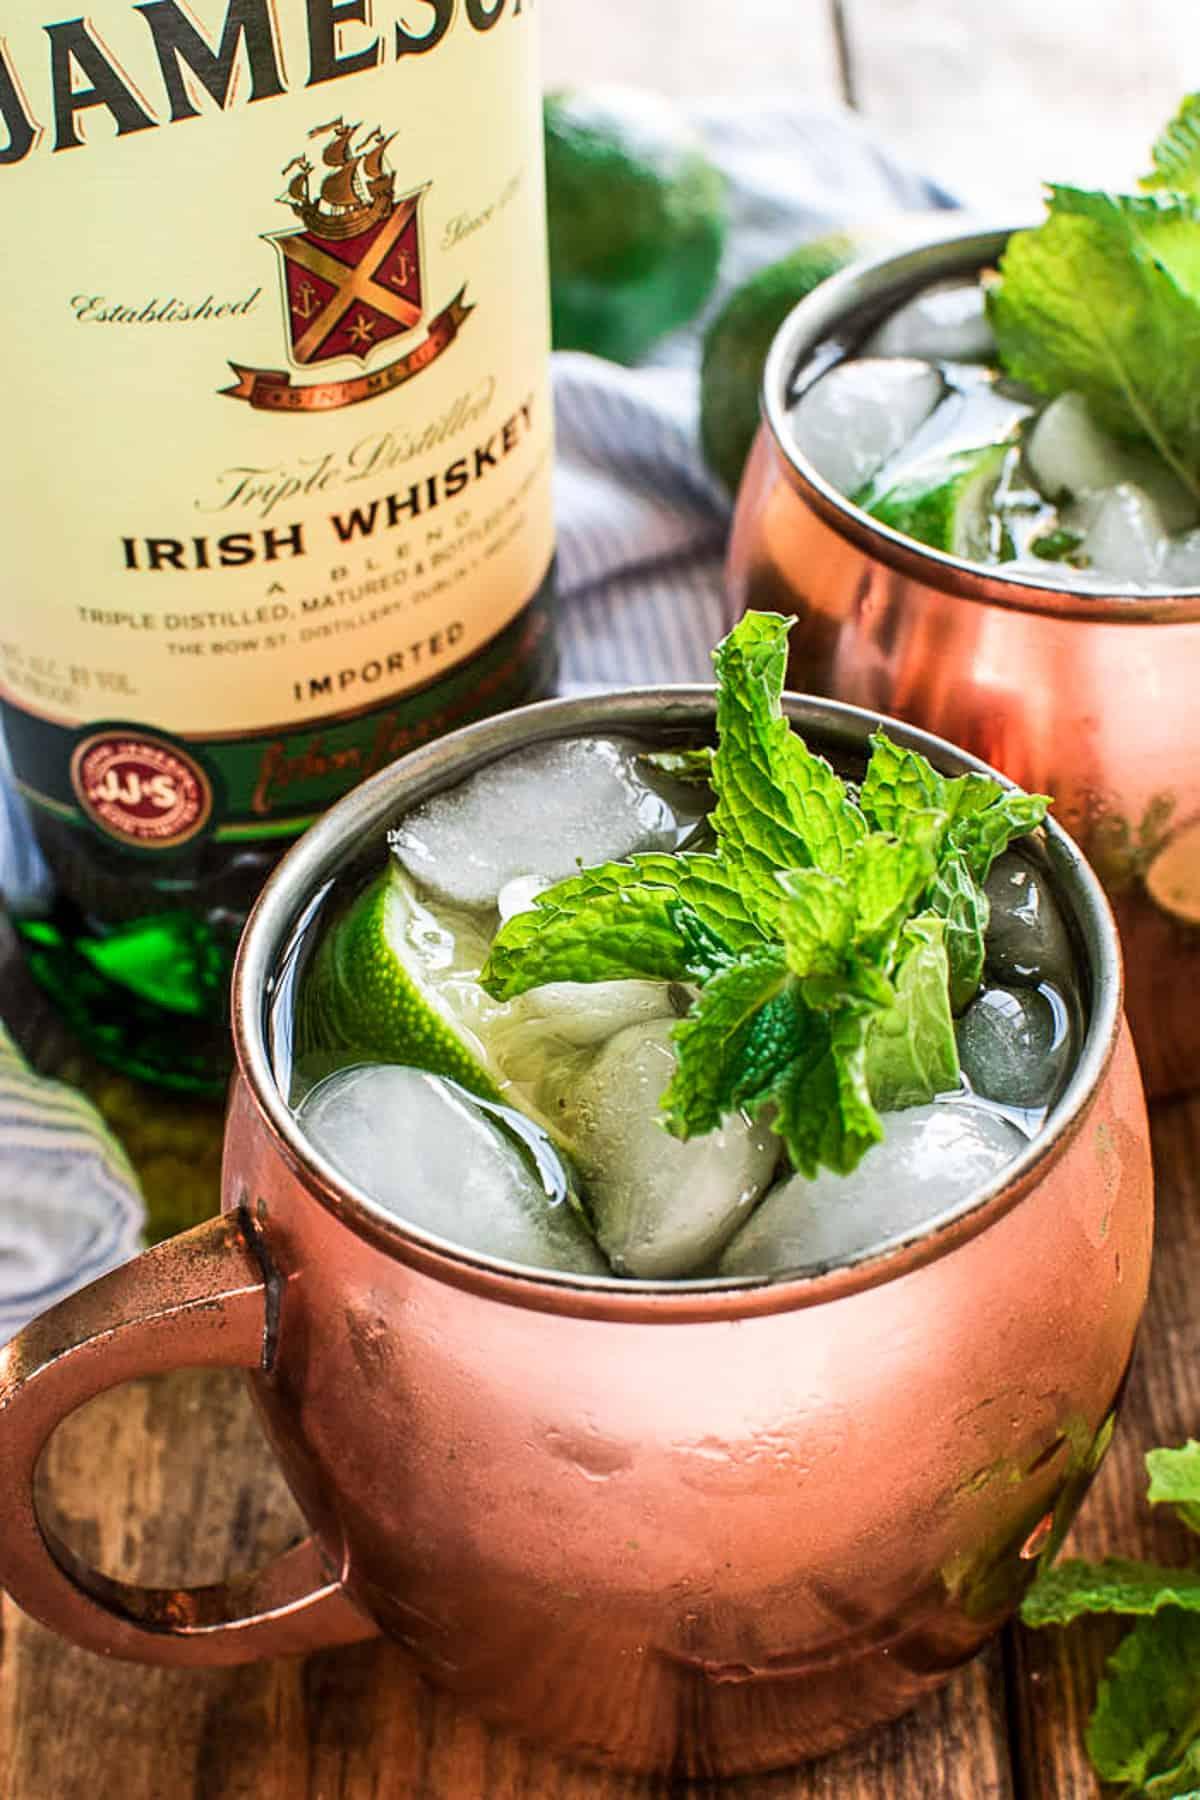 Irish Mule with Jameson Irish Whiskey bottle